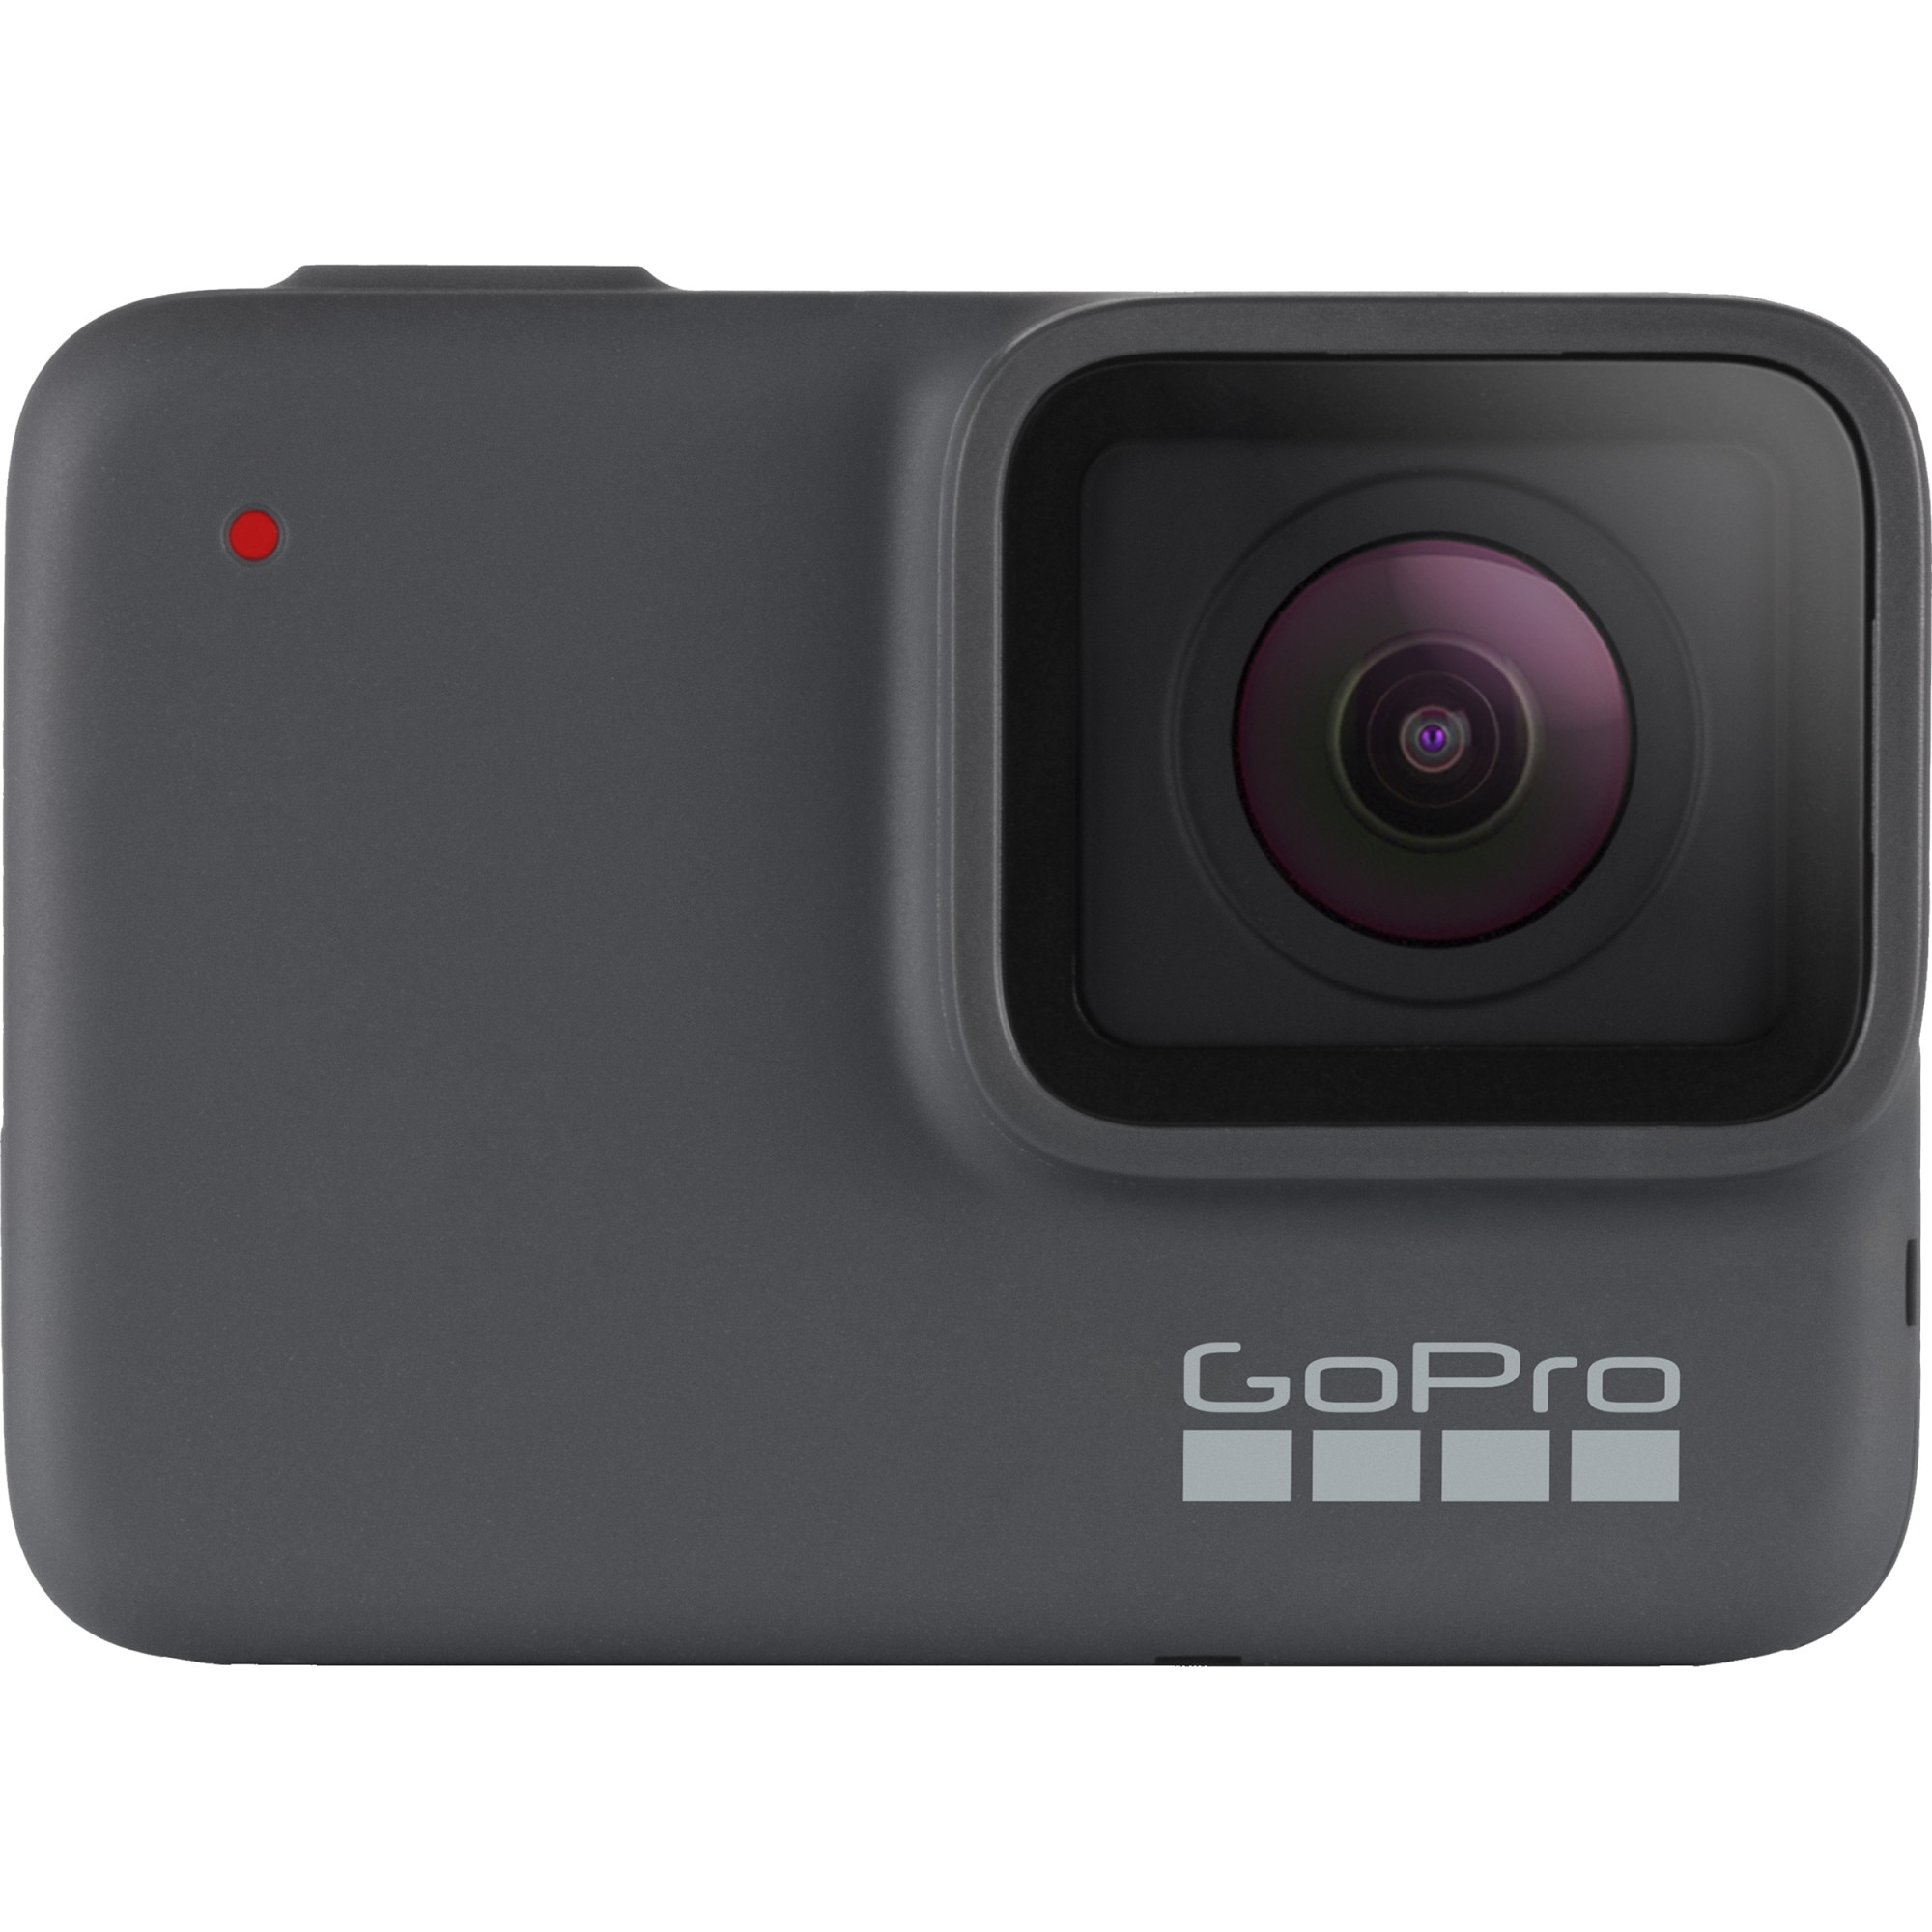 Fotografie Camera video sport GoPro HERO7, 4K, GPS, Silver Edition